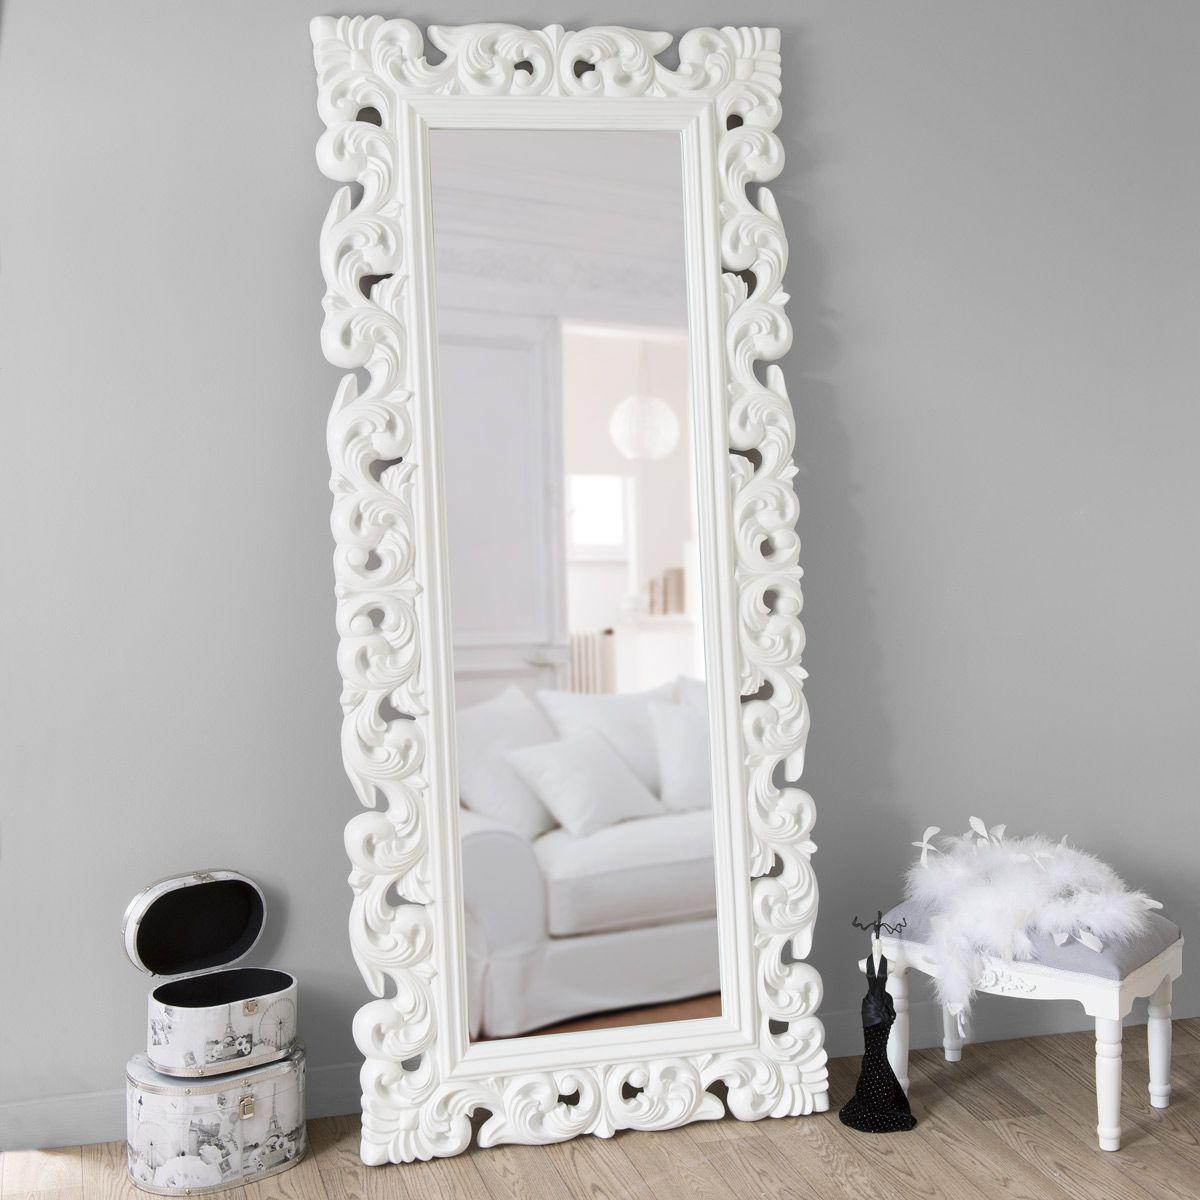 Miroir Rivoli Maison Du Monde Ventana Blog